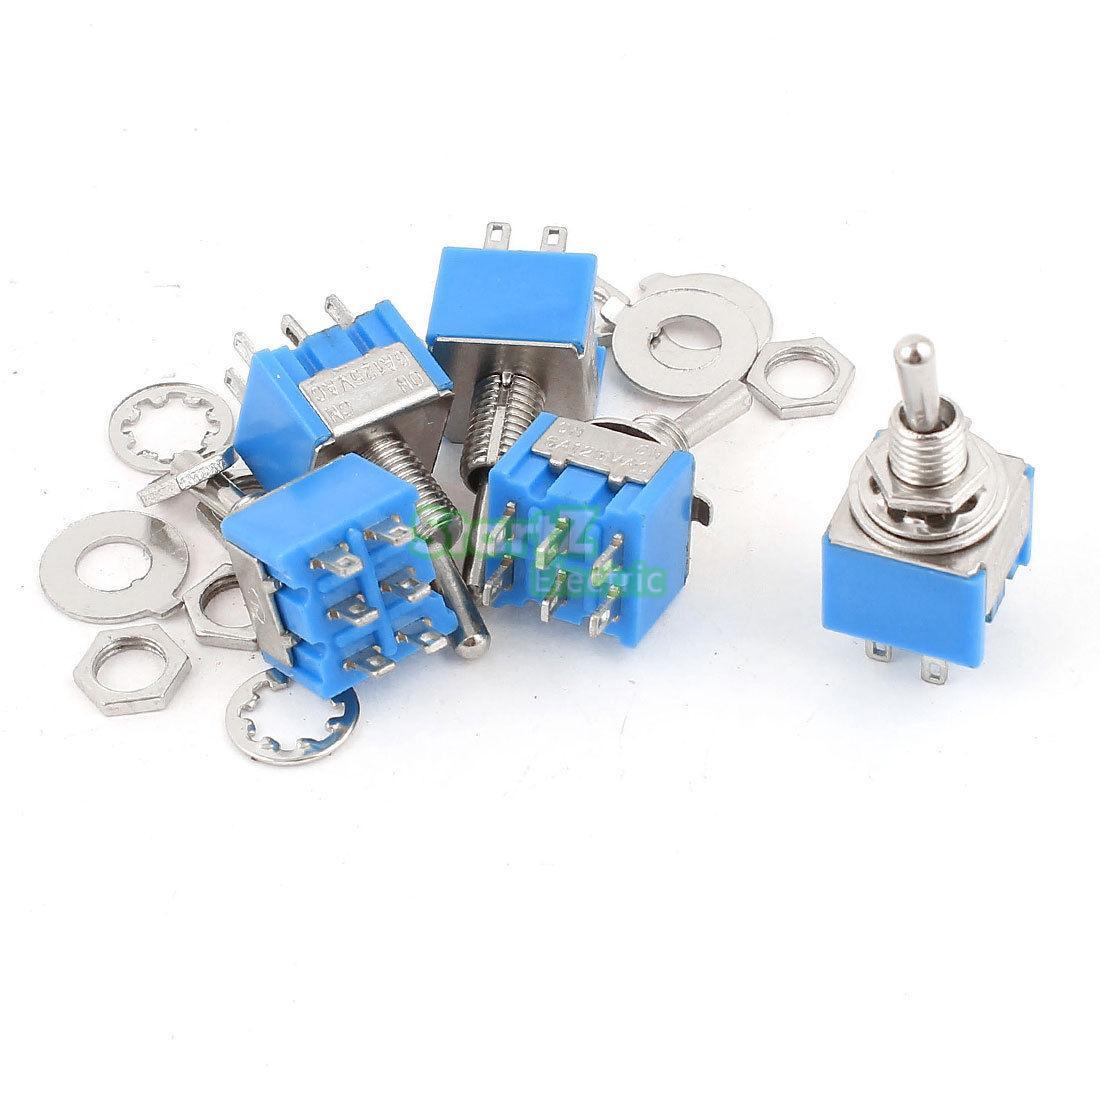 цена на 5Pcs DPDT ON-OFF-ON 3 Positions 6 pin Latching Miniature Toggle Switch AC 125V 6A